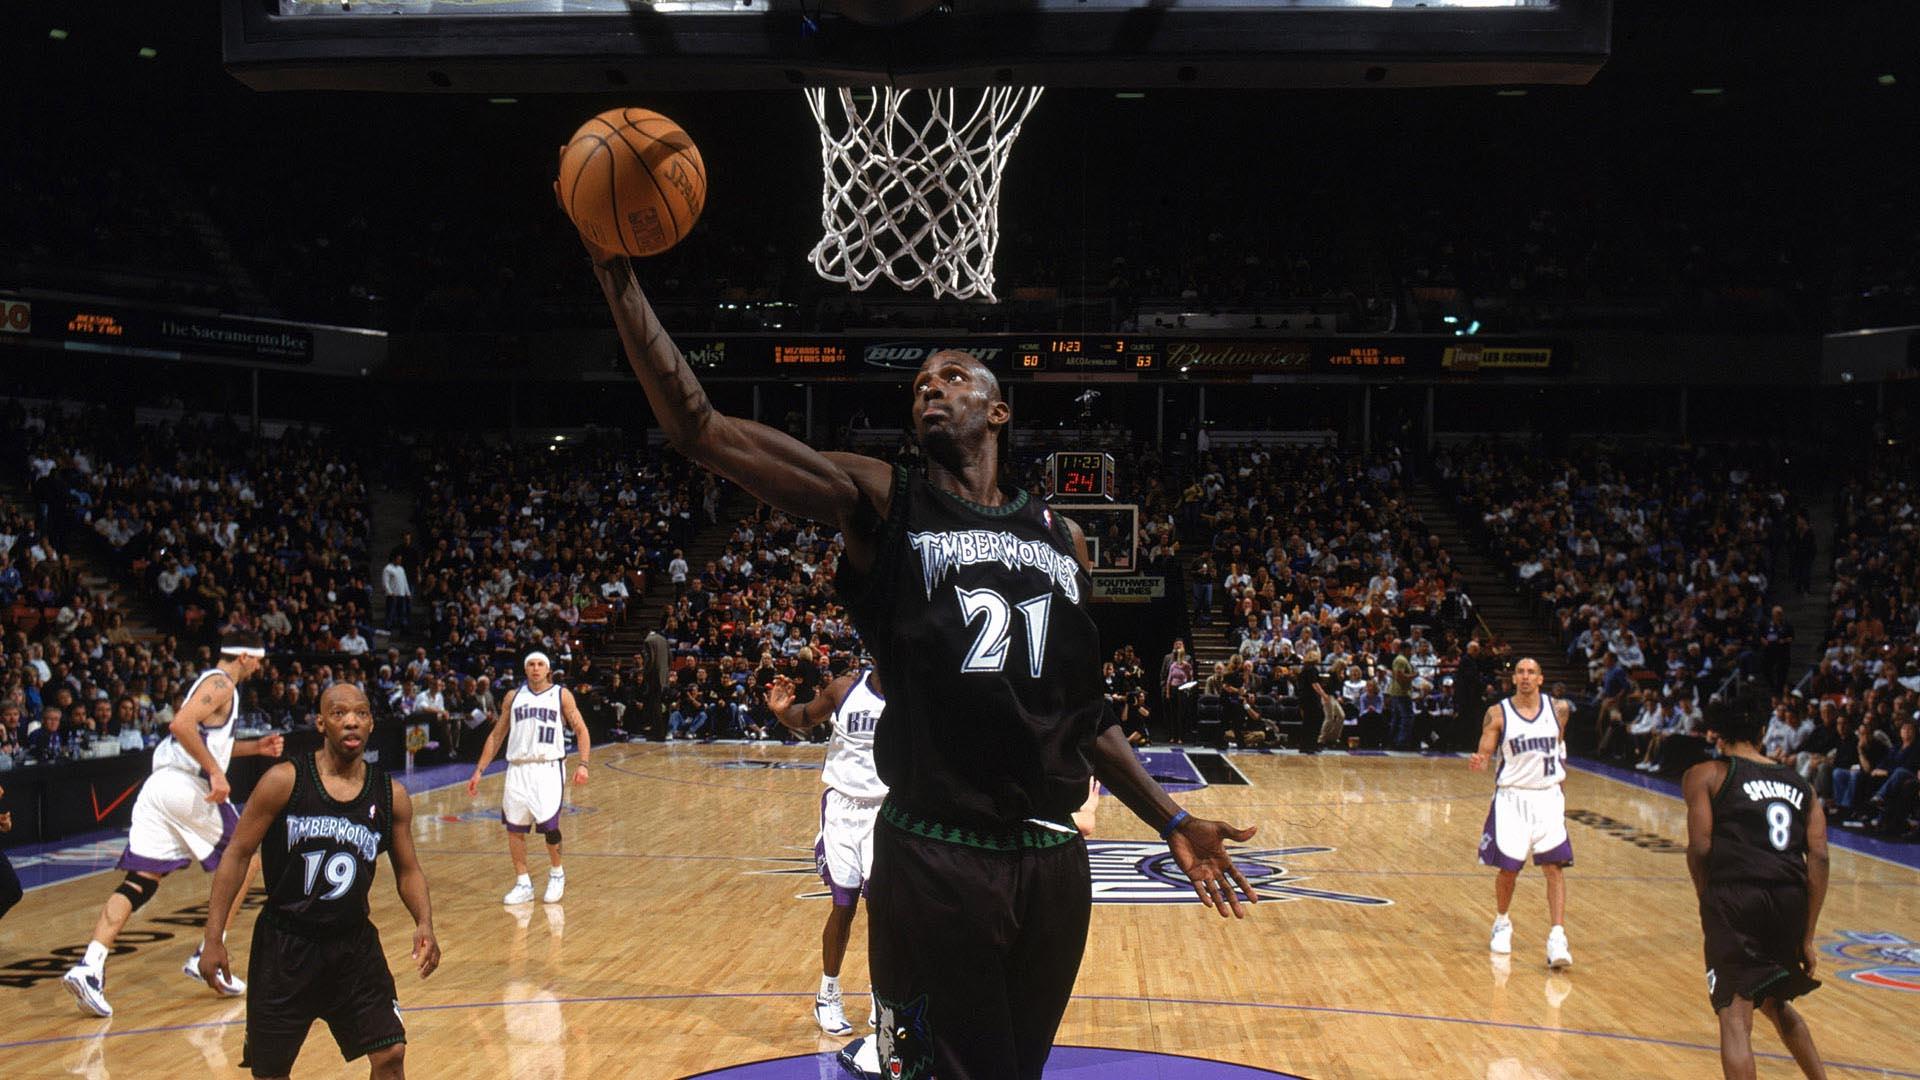 Basketball-Kevin-Garnett-Dunk-http-www-fullhdwpp-com-sports-basketball-kevin-garnett-dunk-wallpaper-wp3602978